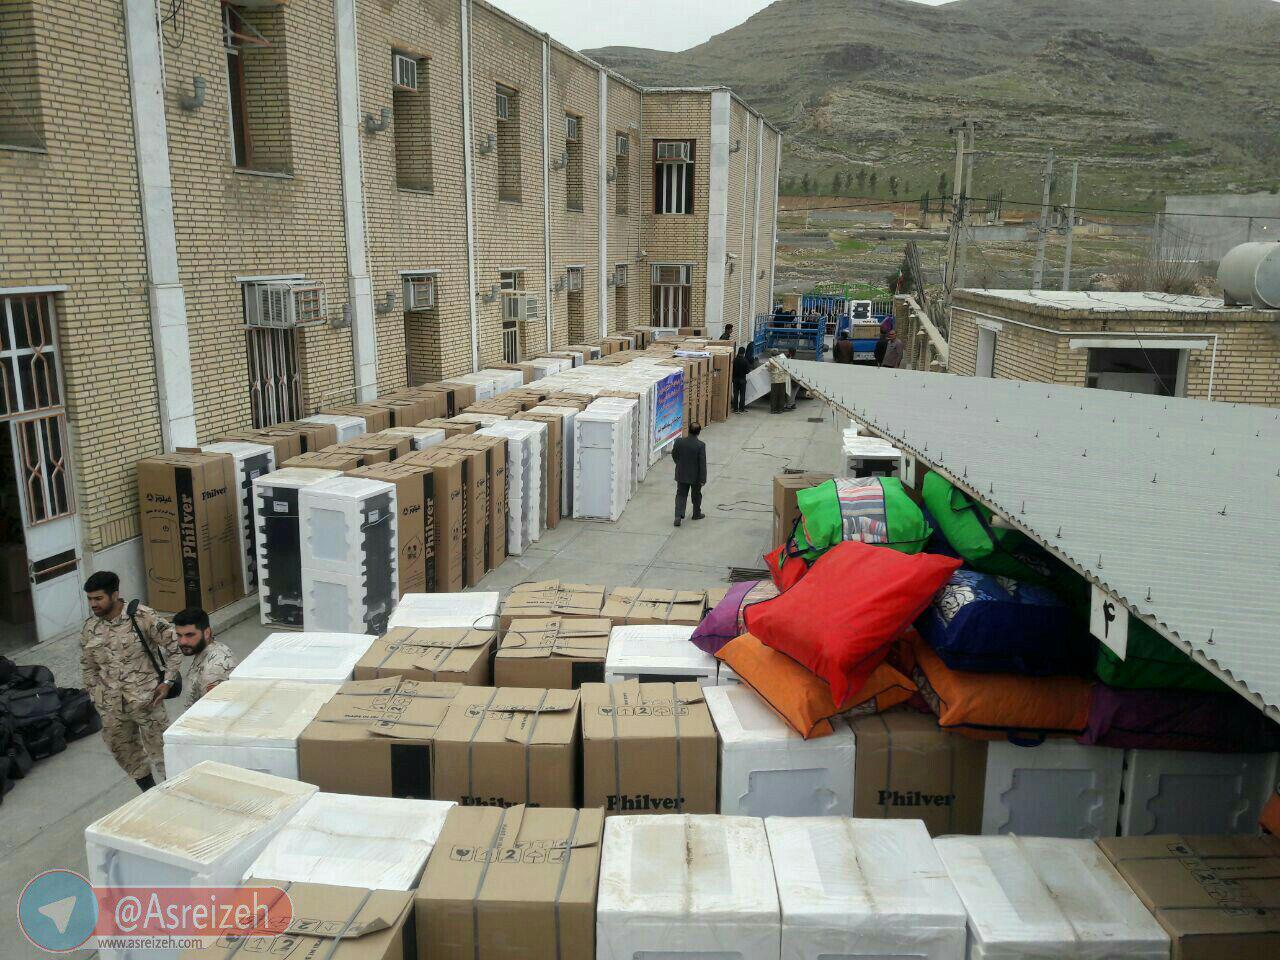 ۱۵۰فقره جهیزیه به نوعروسان مددجوی کمیته امداد ایذه اهدا شد